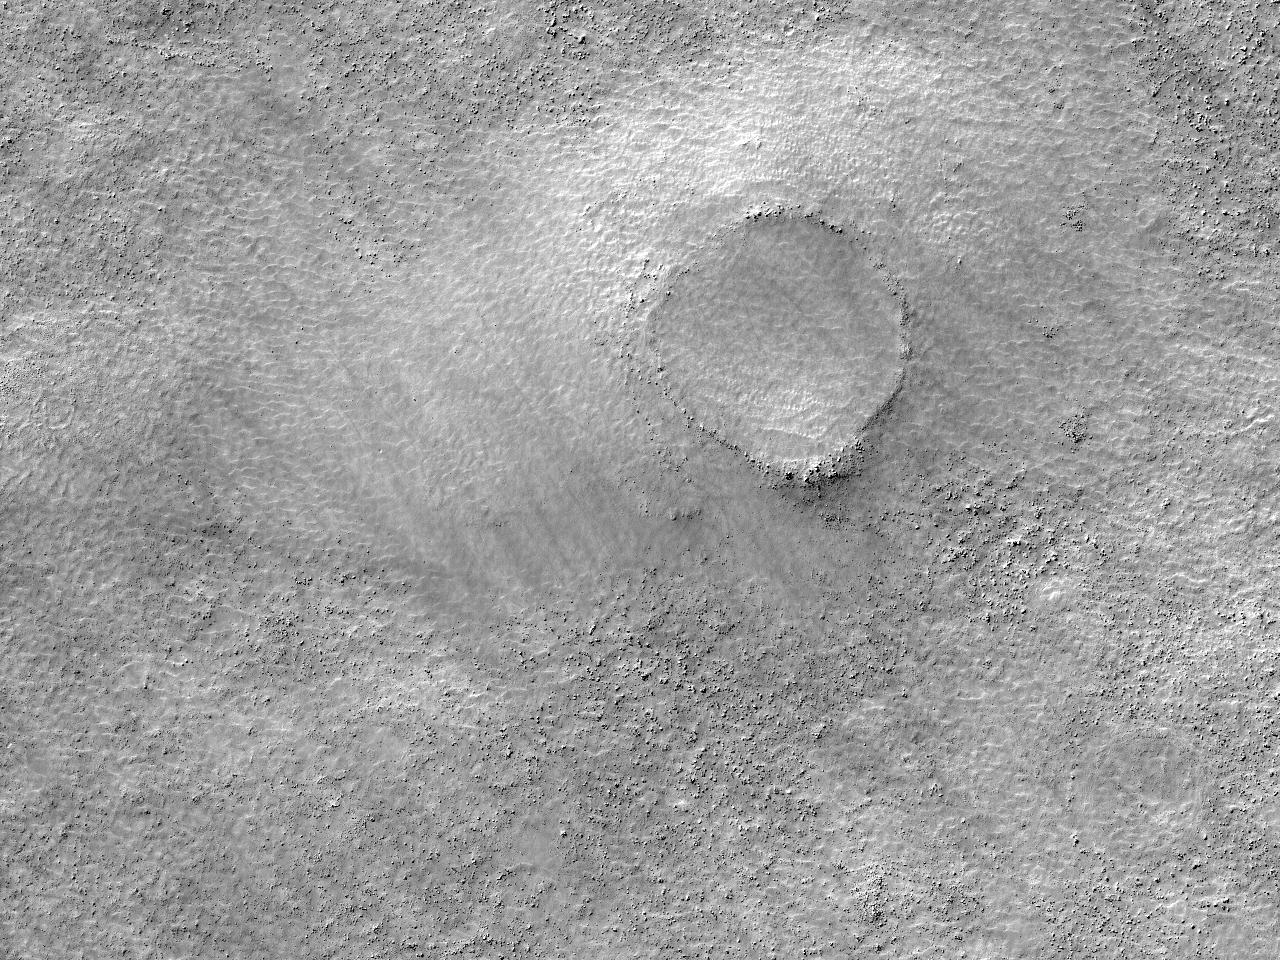 Кратер земли Terra Cimmeria